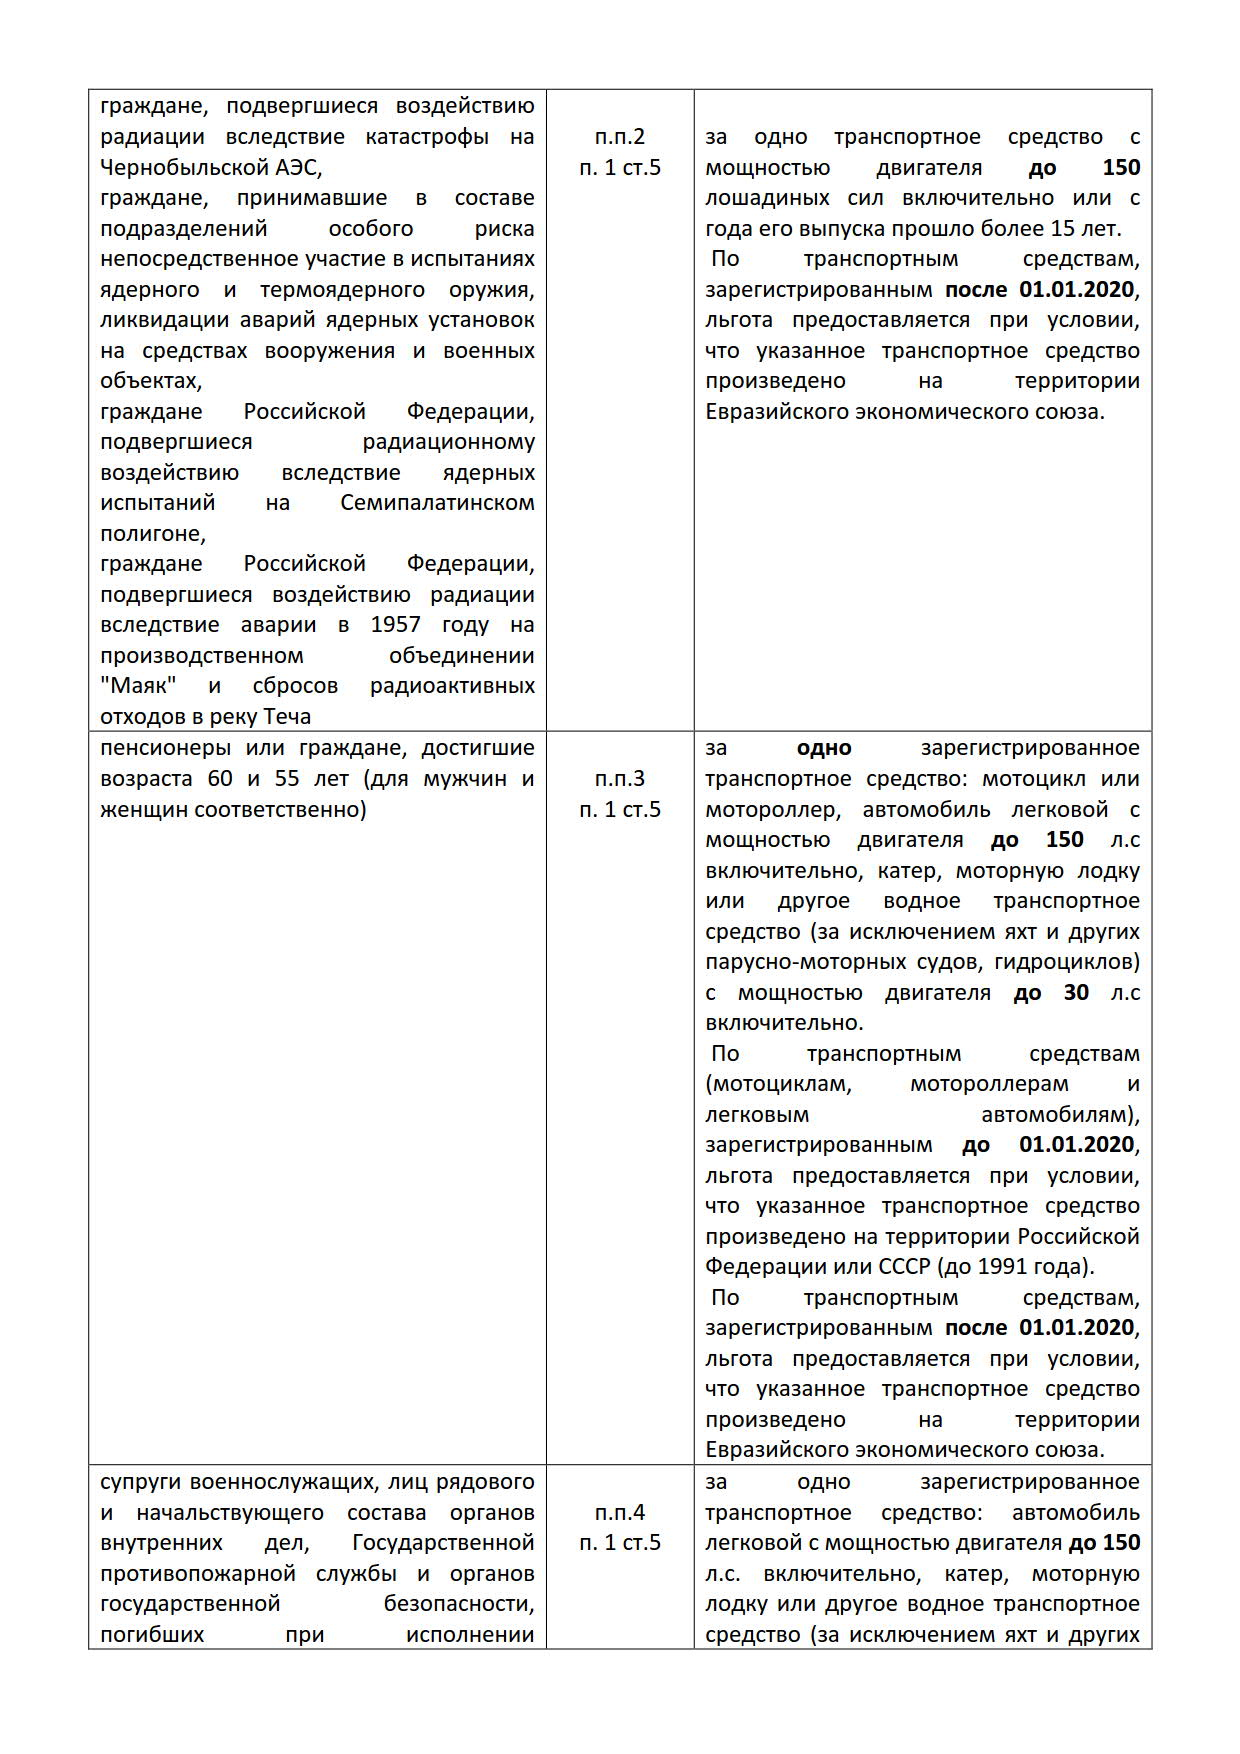 43_Льготы Транспорт 2020_2